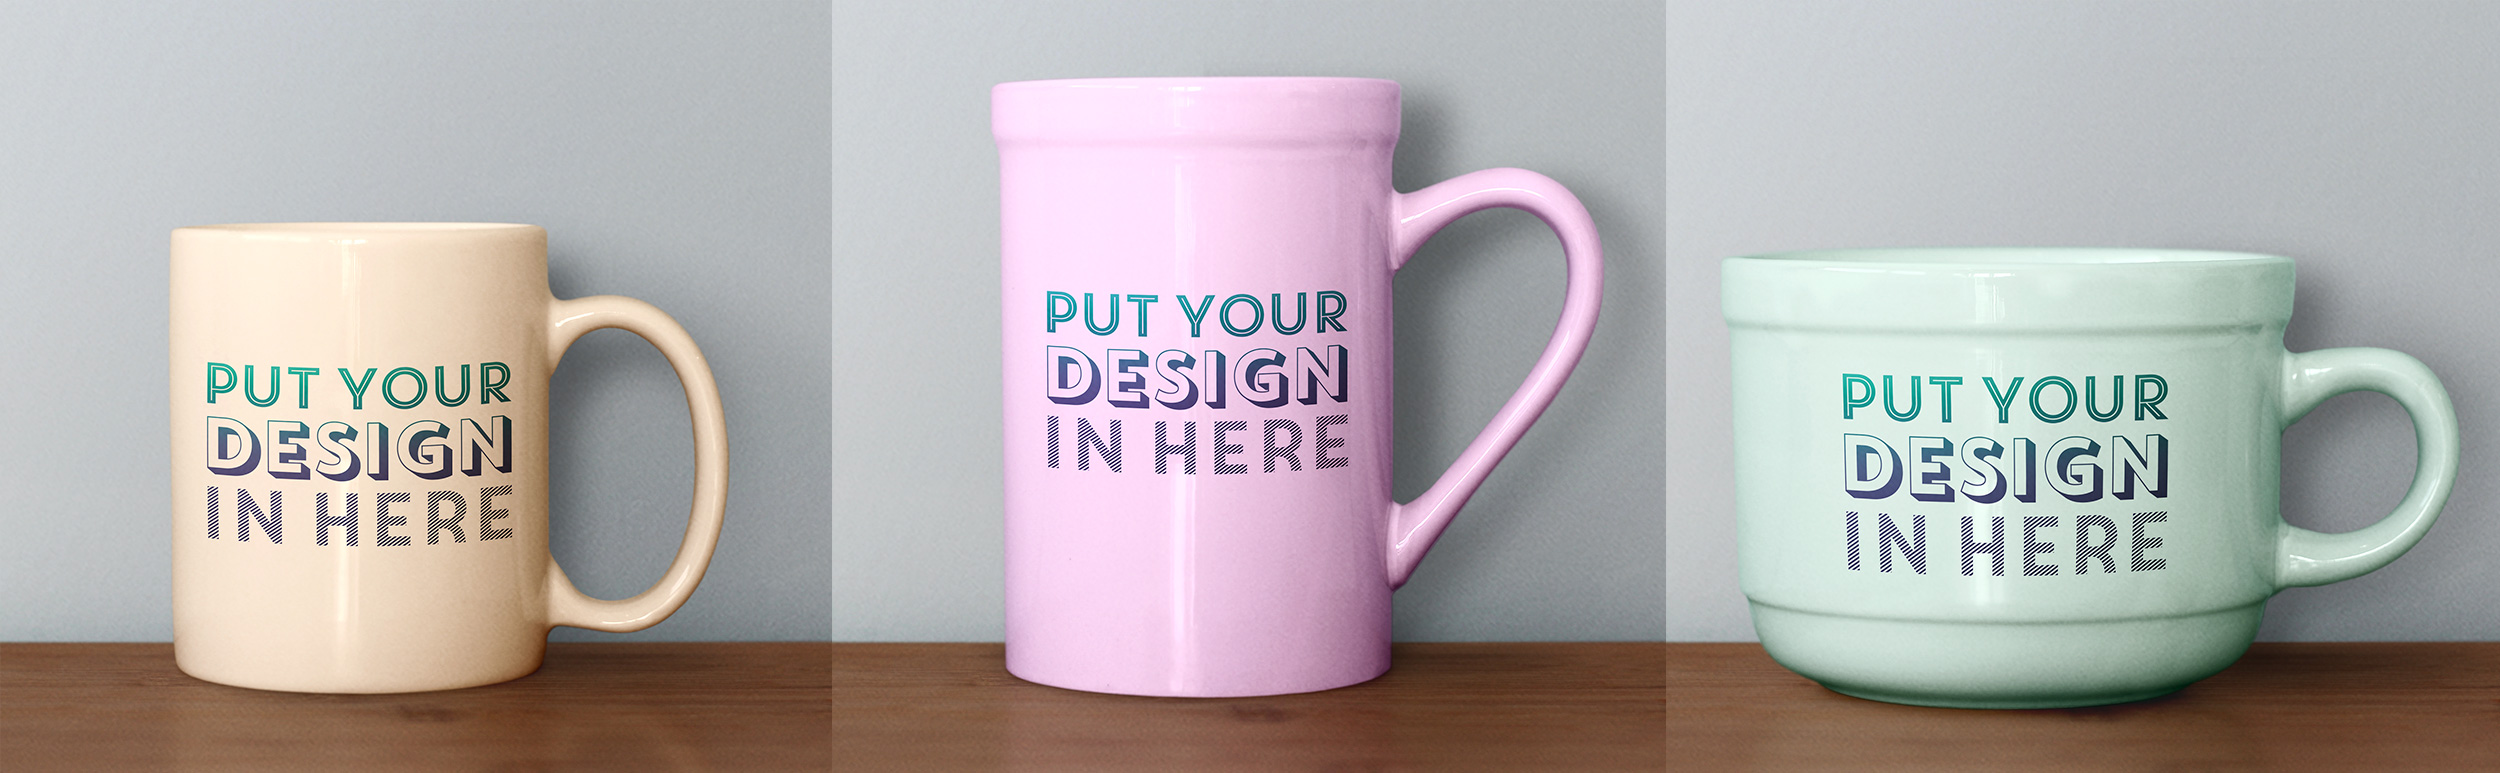 mug design template seesums